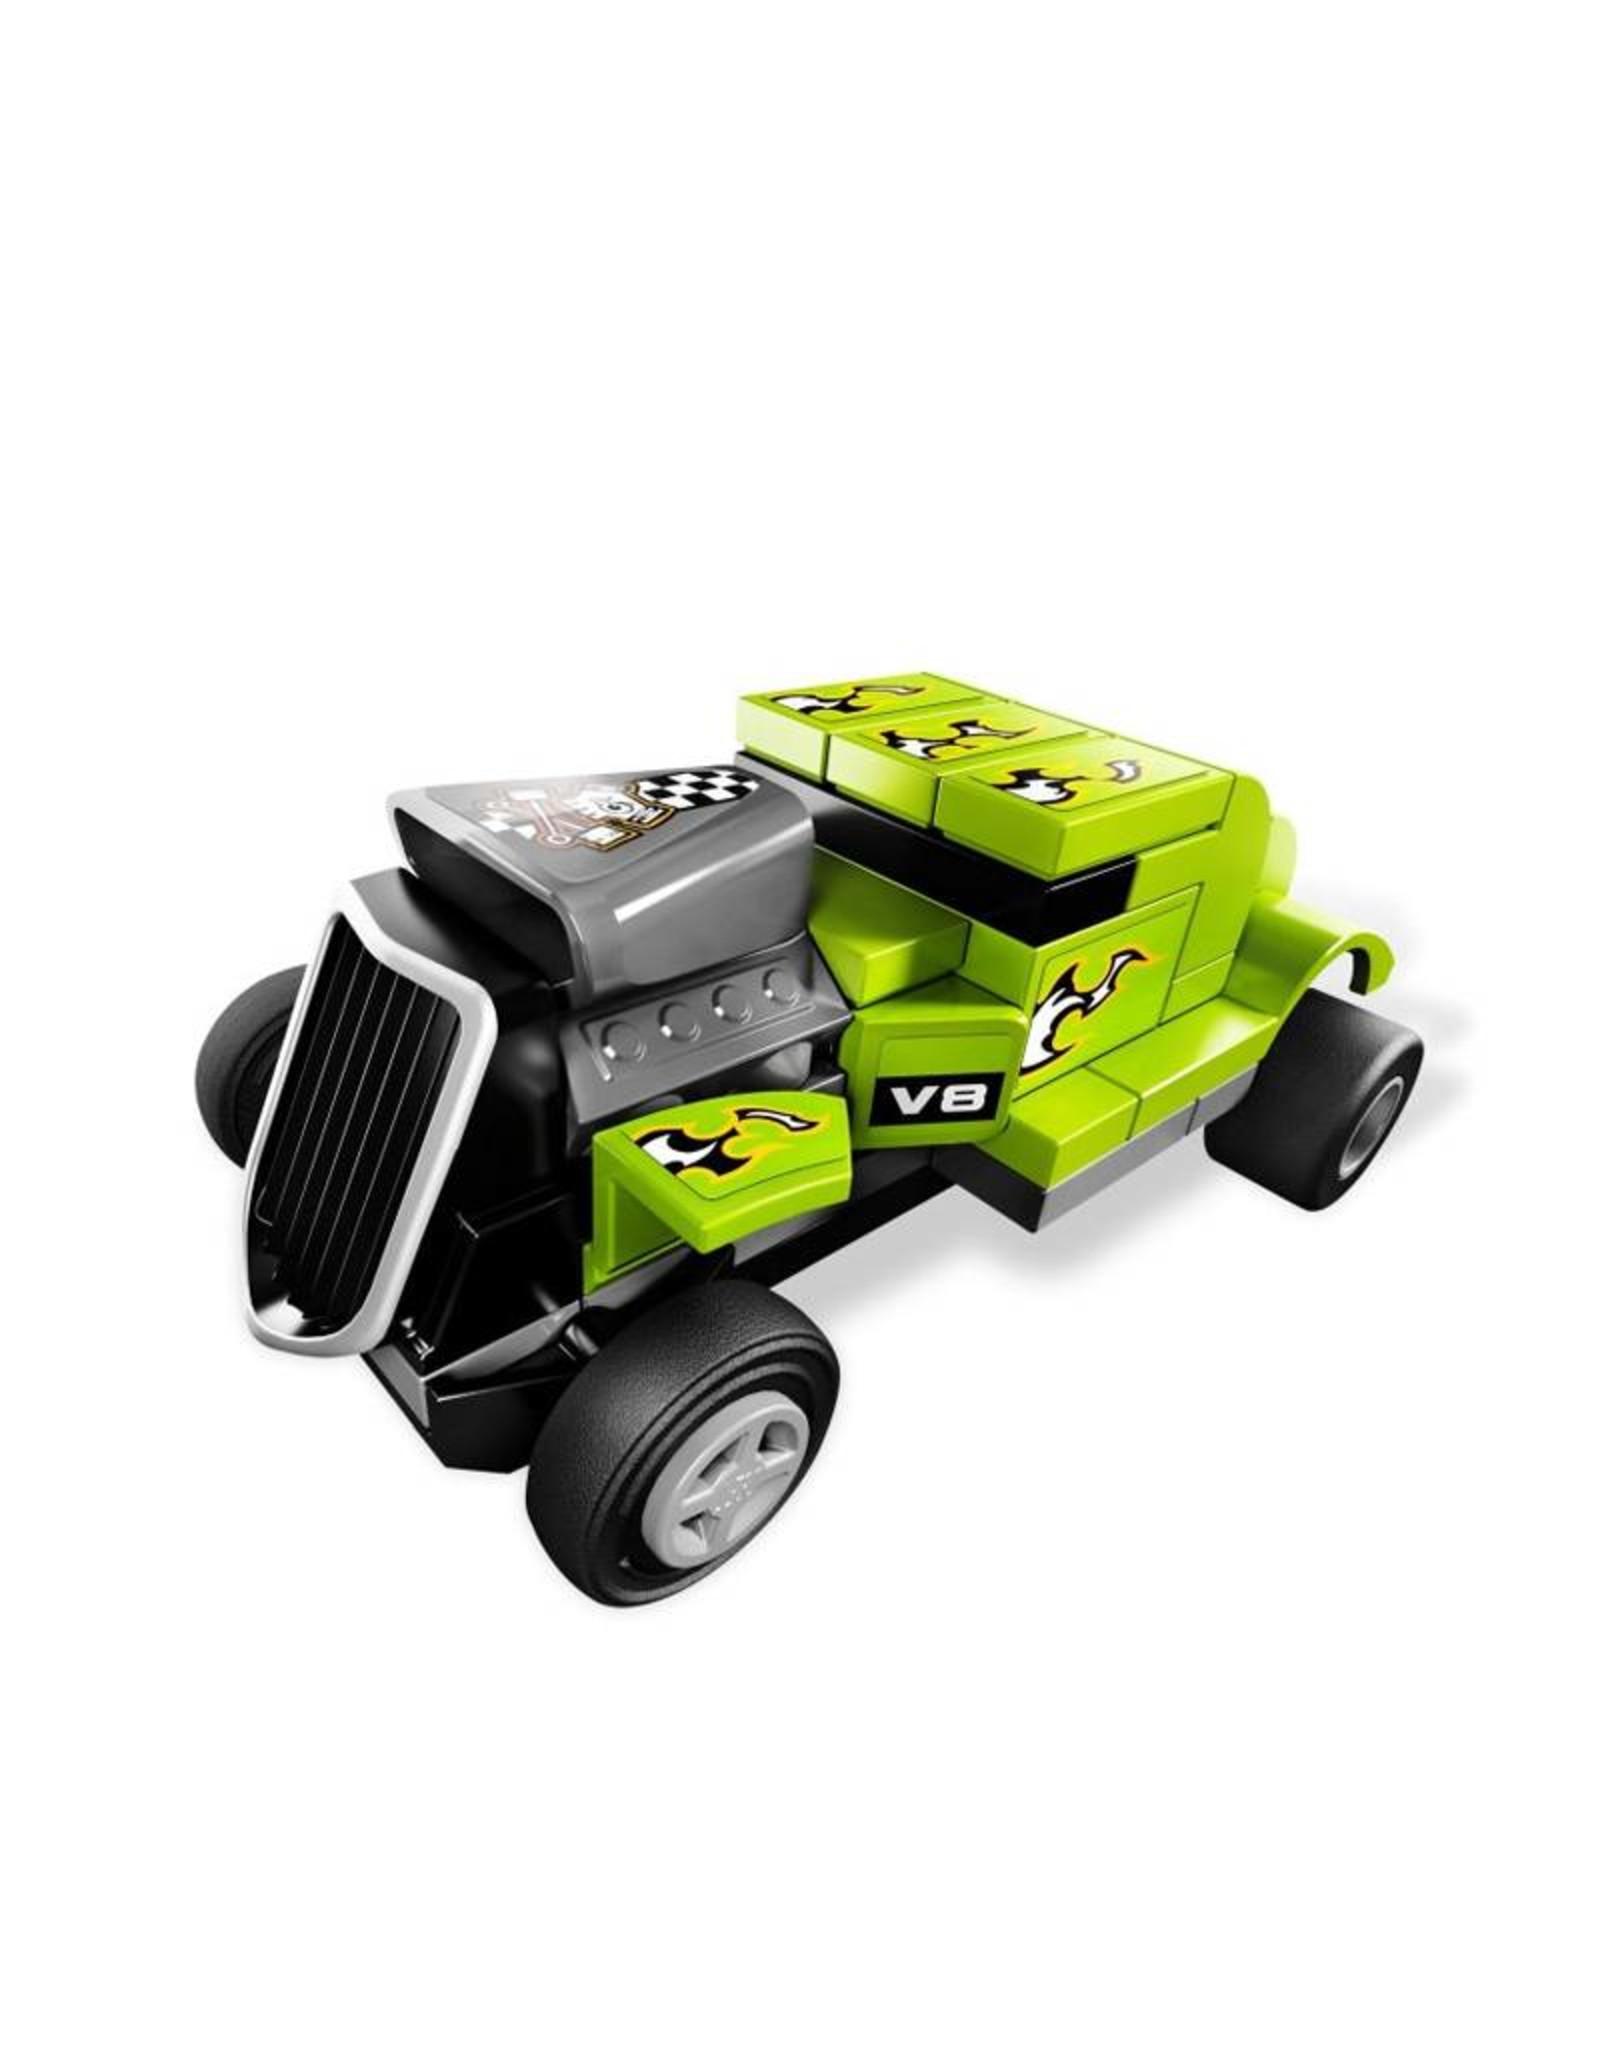 LEGO LEGO 8302 Rod Rider RACERS